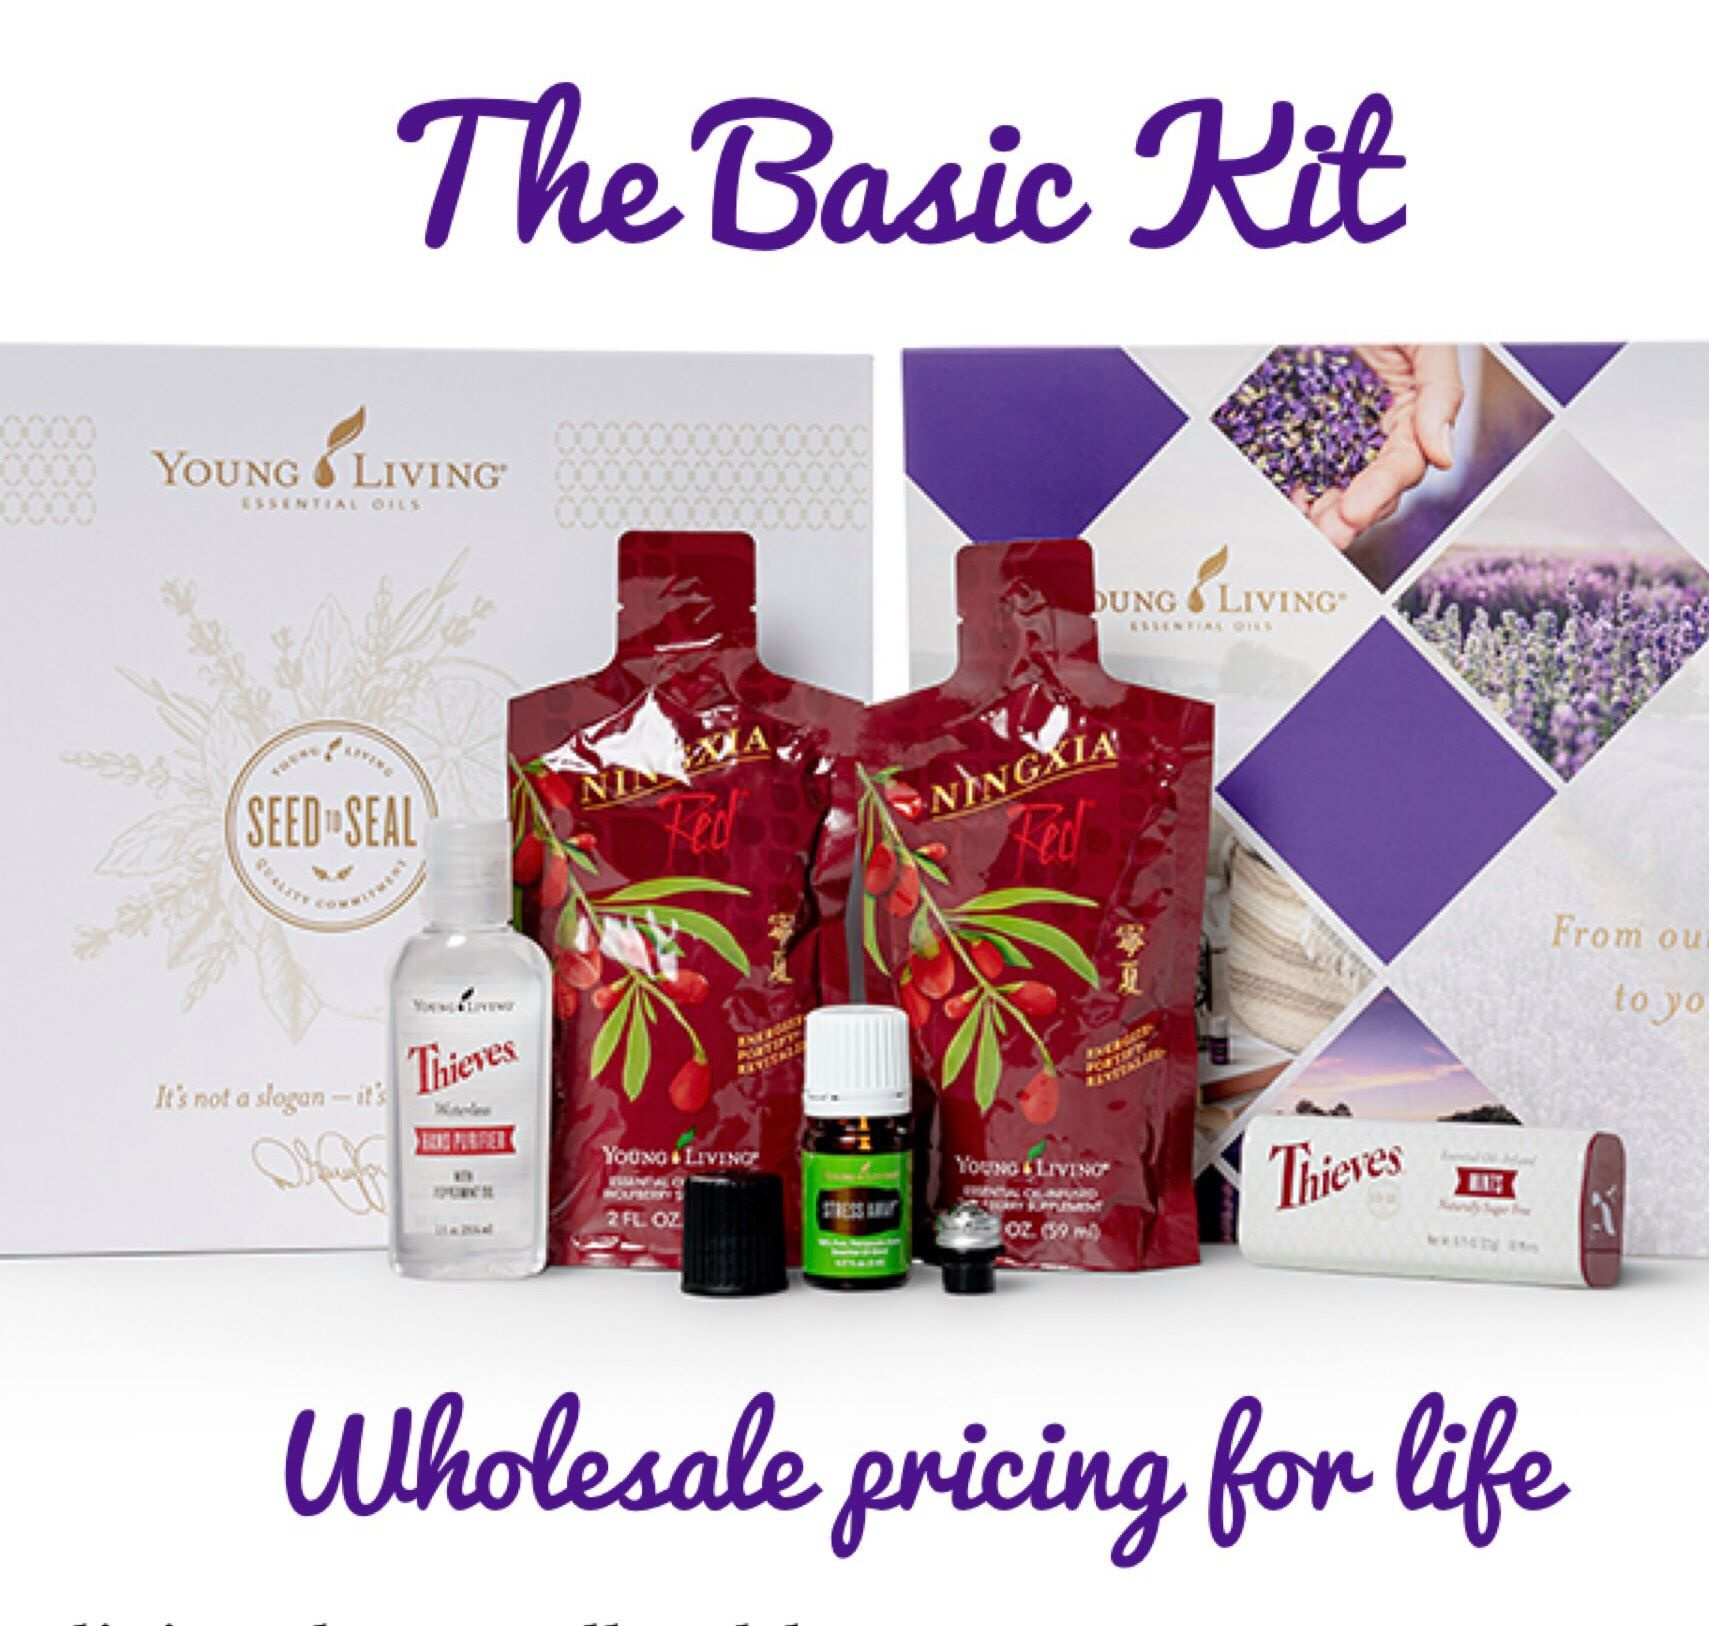 The Basic Kit